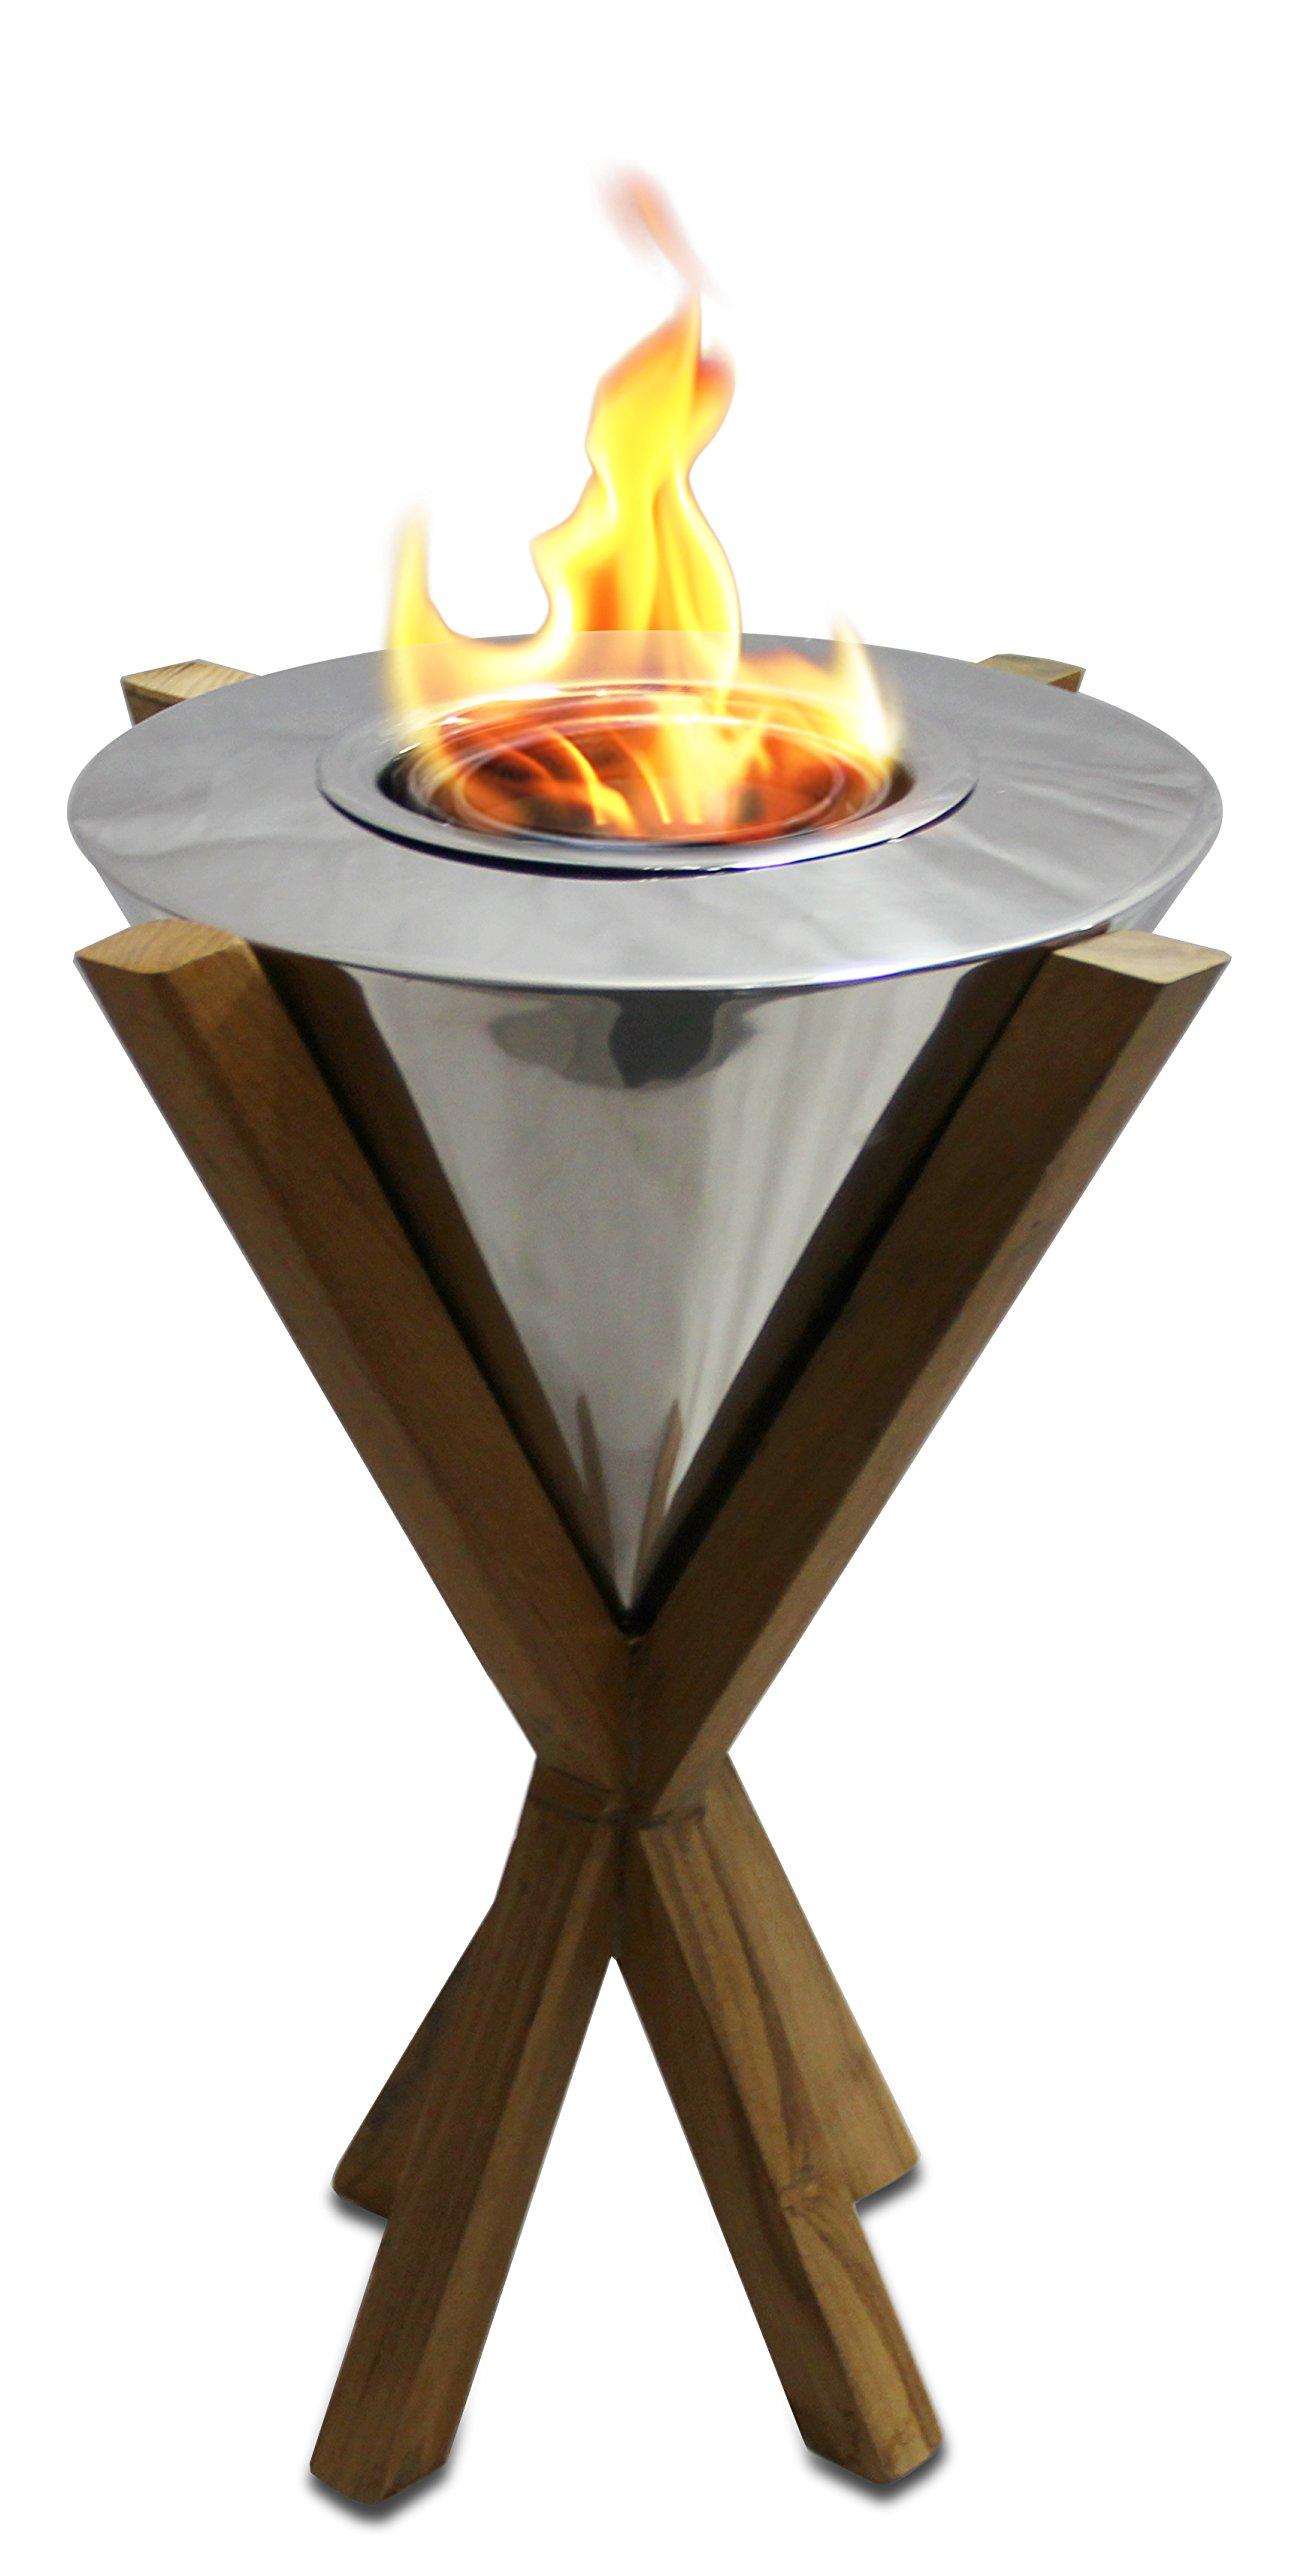 My Swanky Home Luxe Freestanding Modern Teak Wood Torch Light | 14'' Outdoor Flame Island Luxury